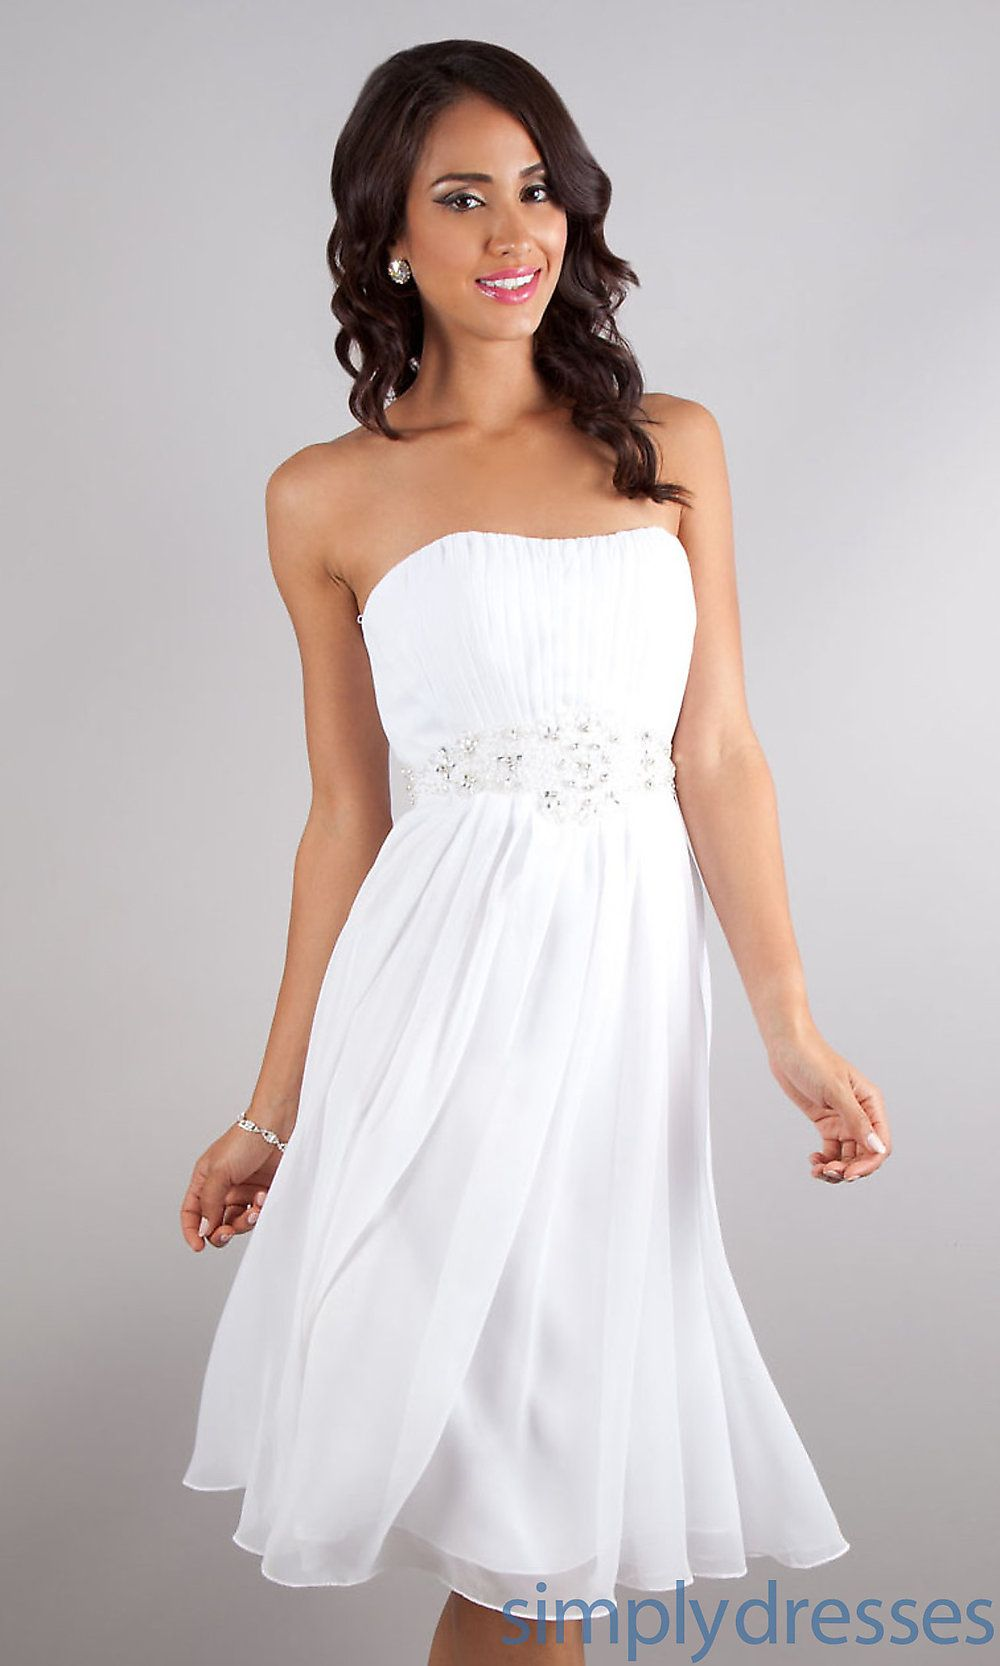 View Dress Detail Dq 8569w White Homecoming Dresses Short Bridesmaid Dresses Cheap Bridesmaid Dresses [ 1666 x 1000 Pixel ]